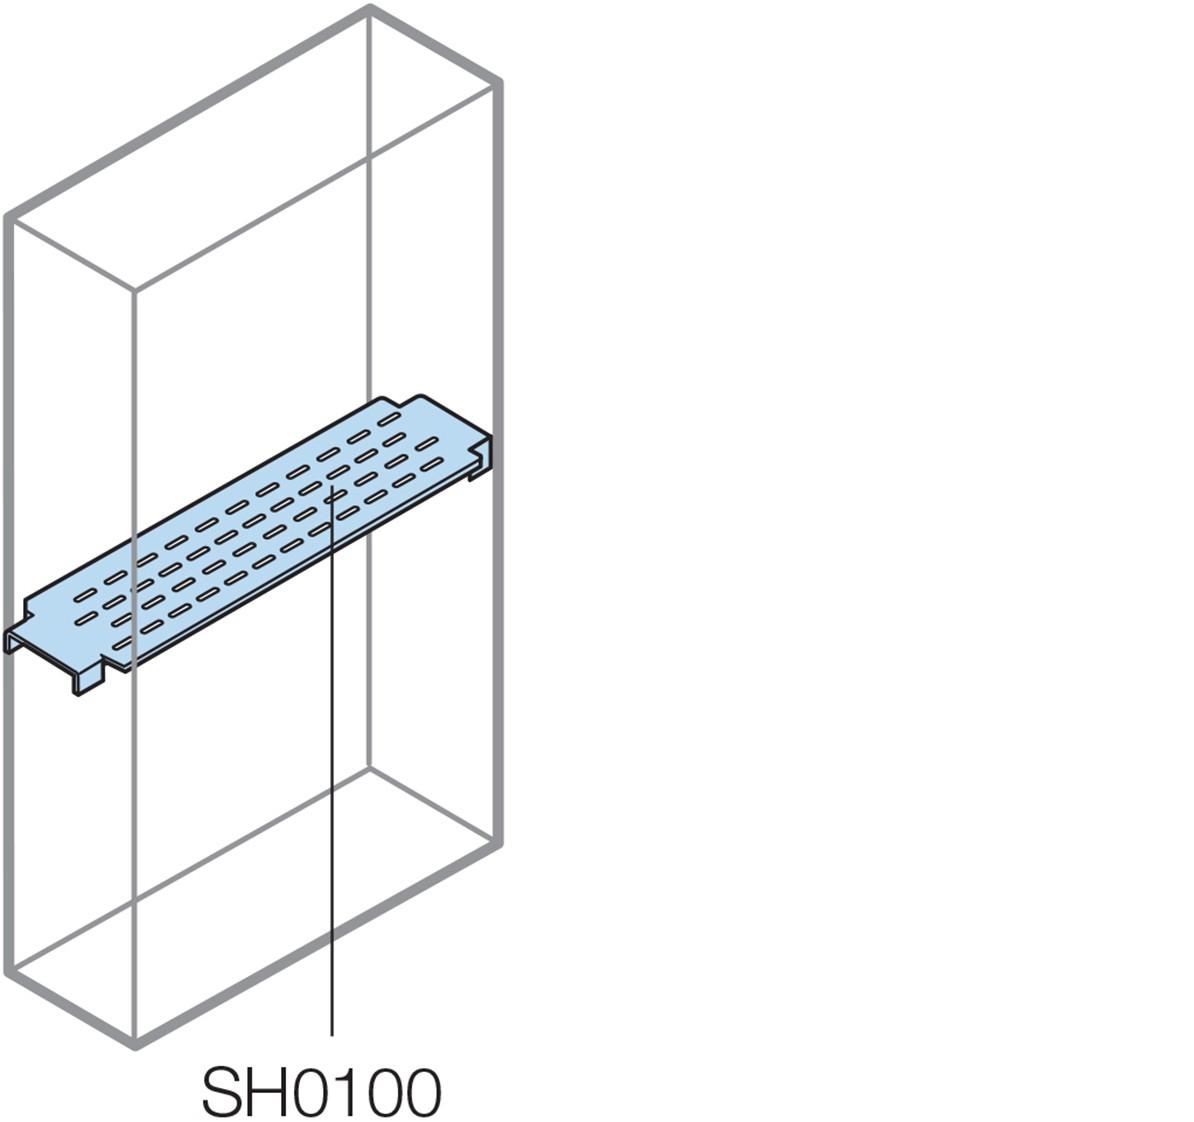 RIPIANO ORIZZ. L PAV - ABB SH0200